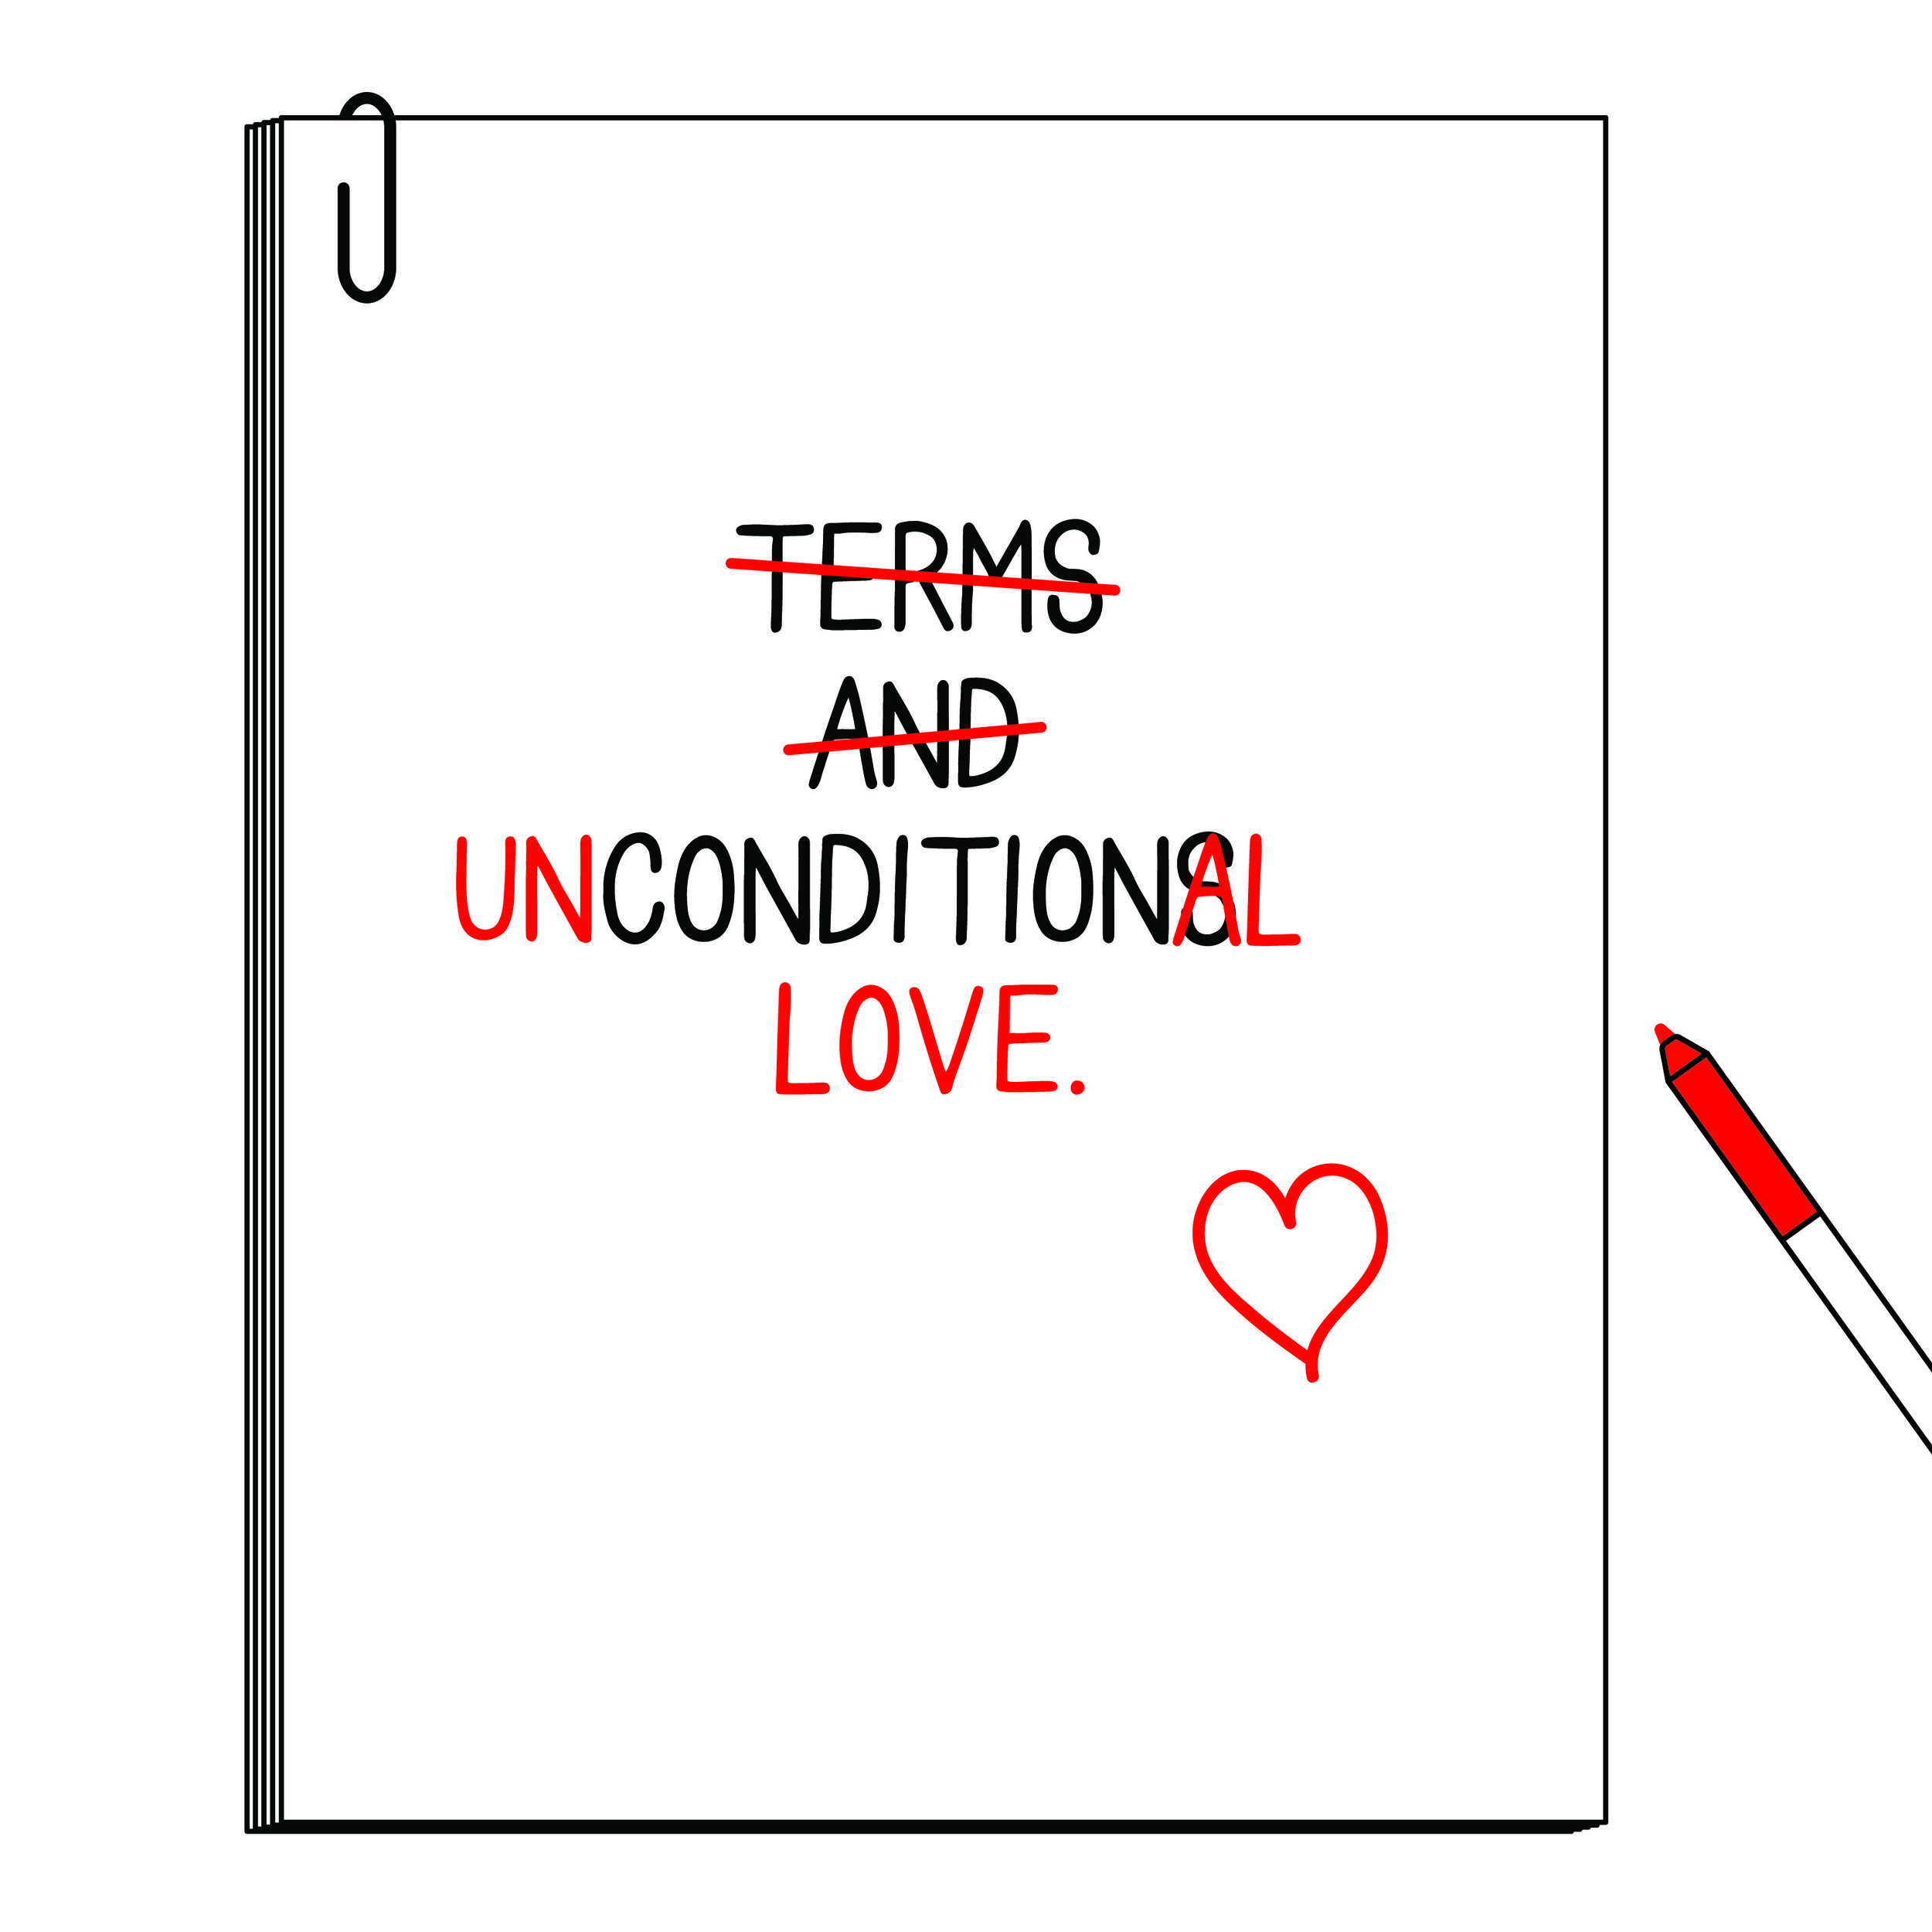 termsandconditions-01.jpg